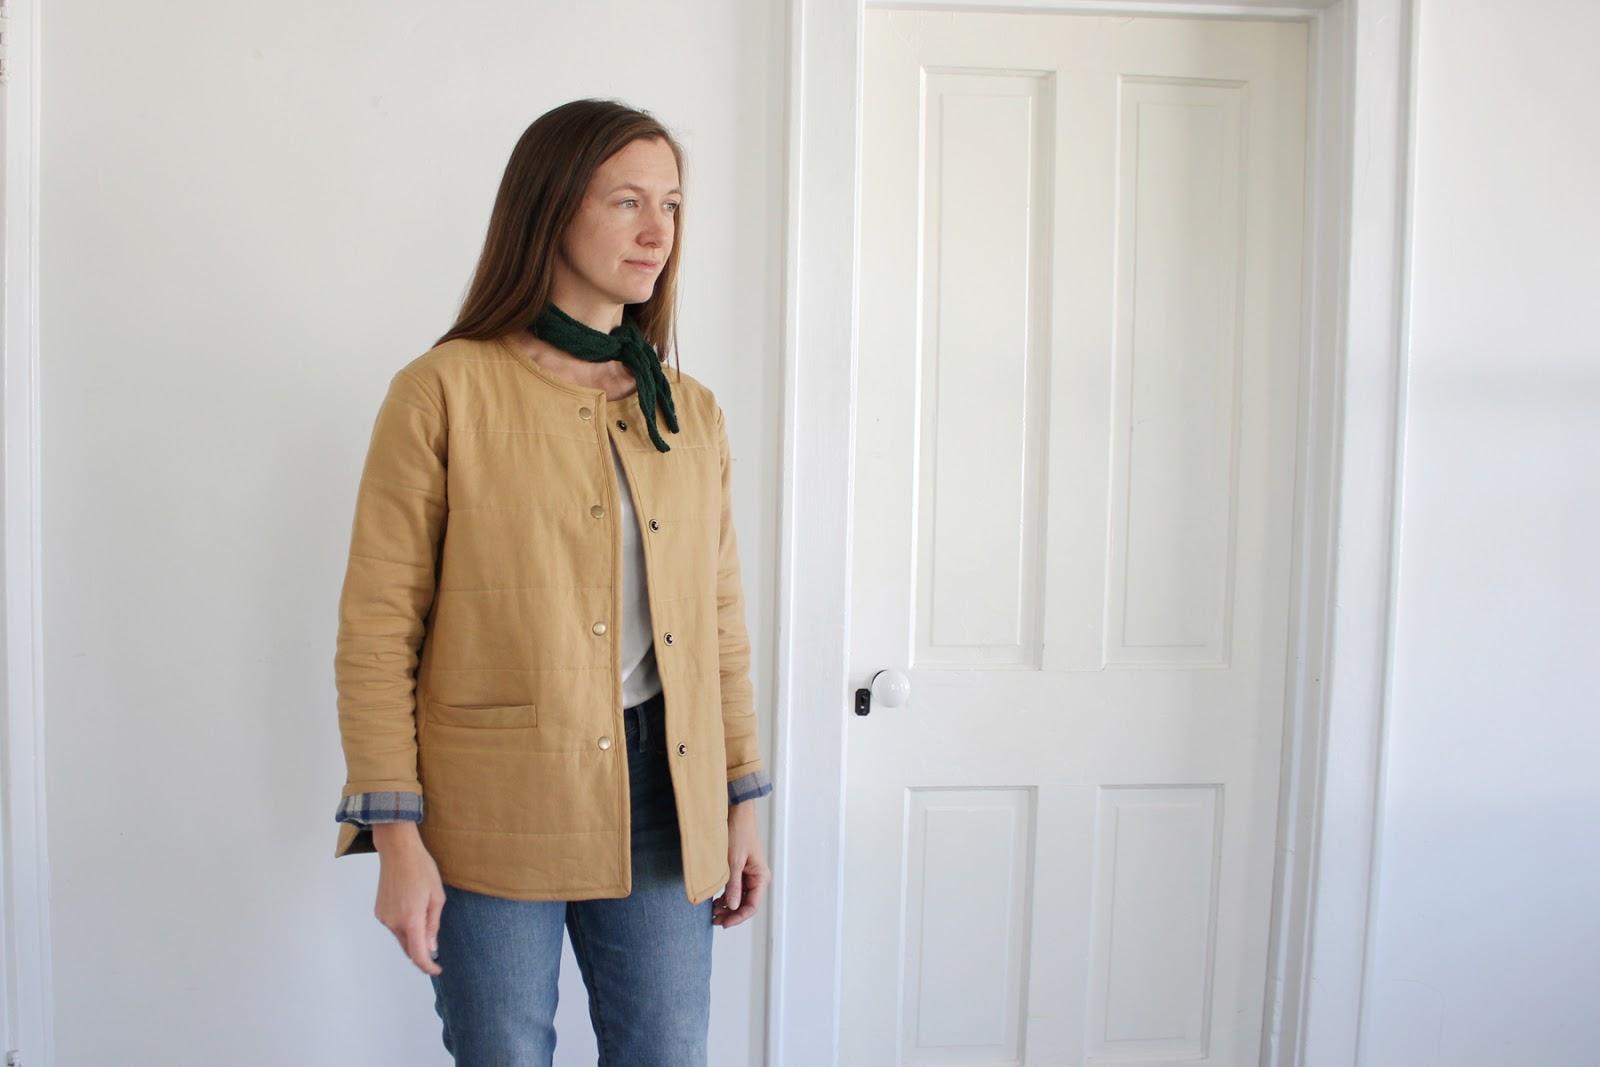 359f90c4c26e04 SweetKM  Indiesew Fall Winter   Grainline Studio Tamarack Jacket